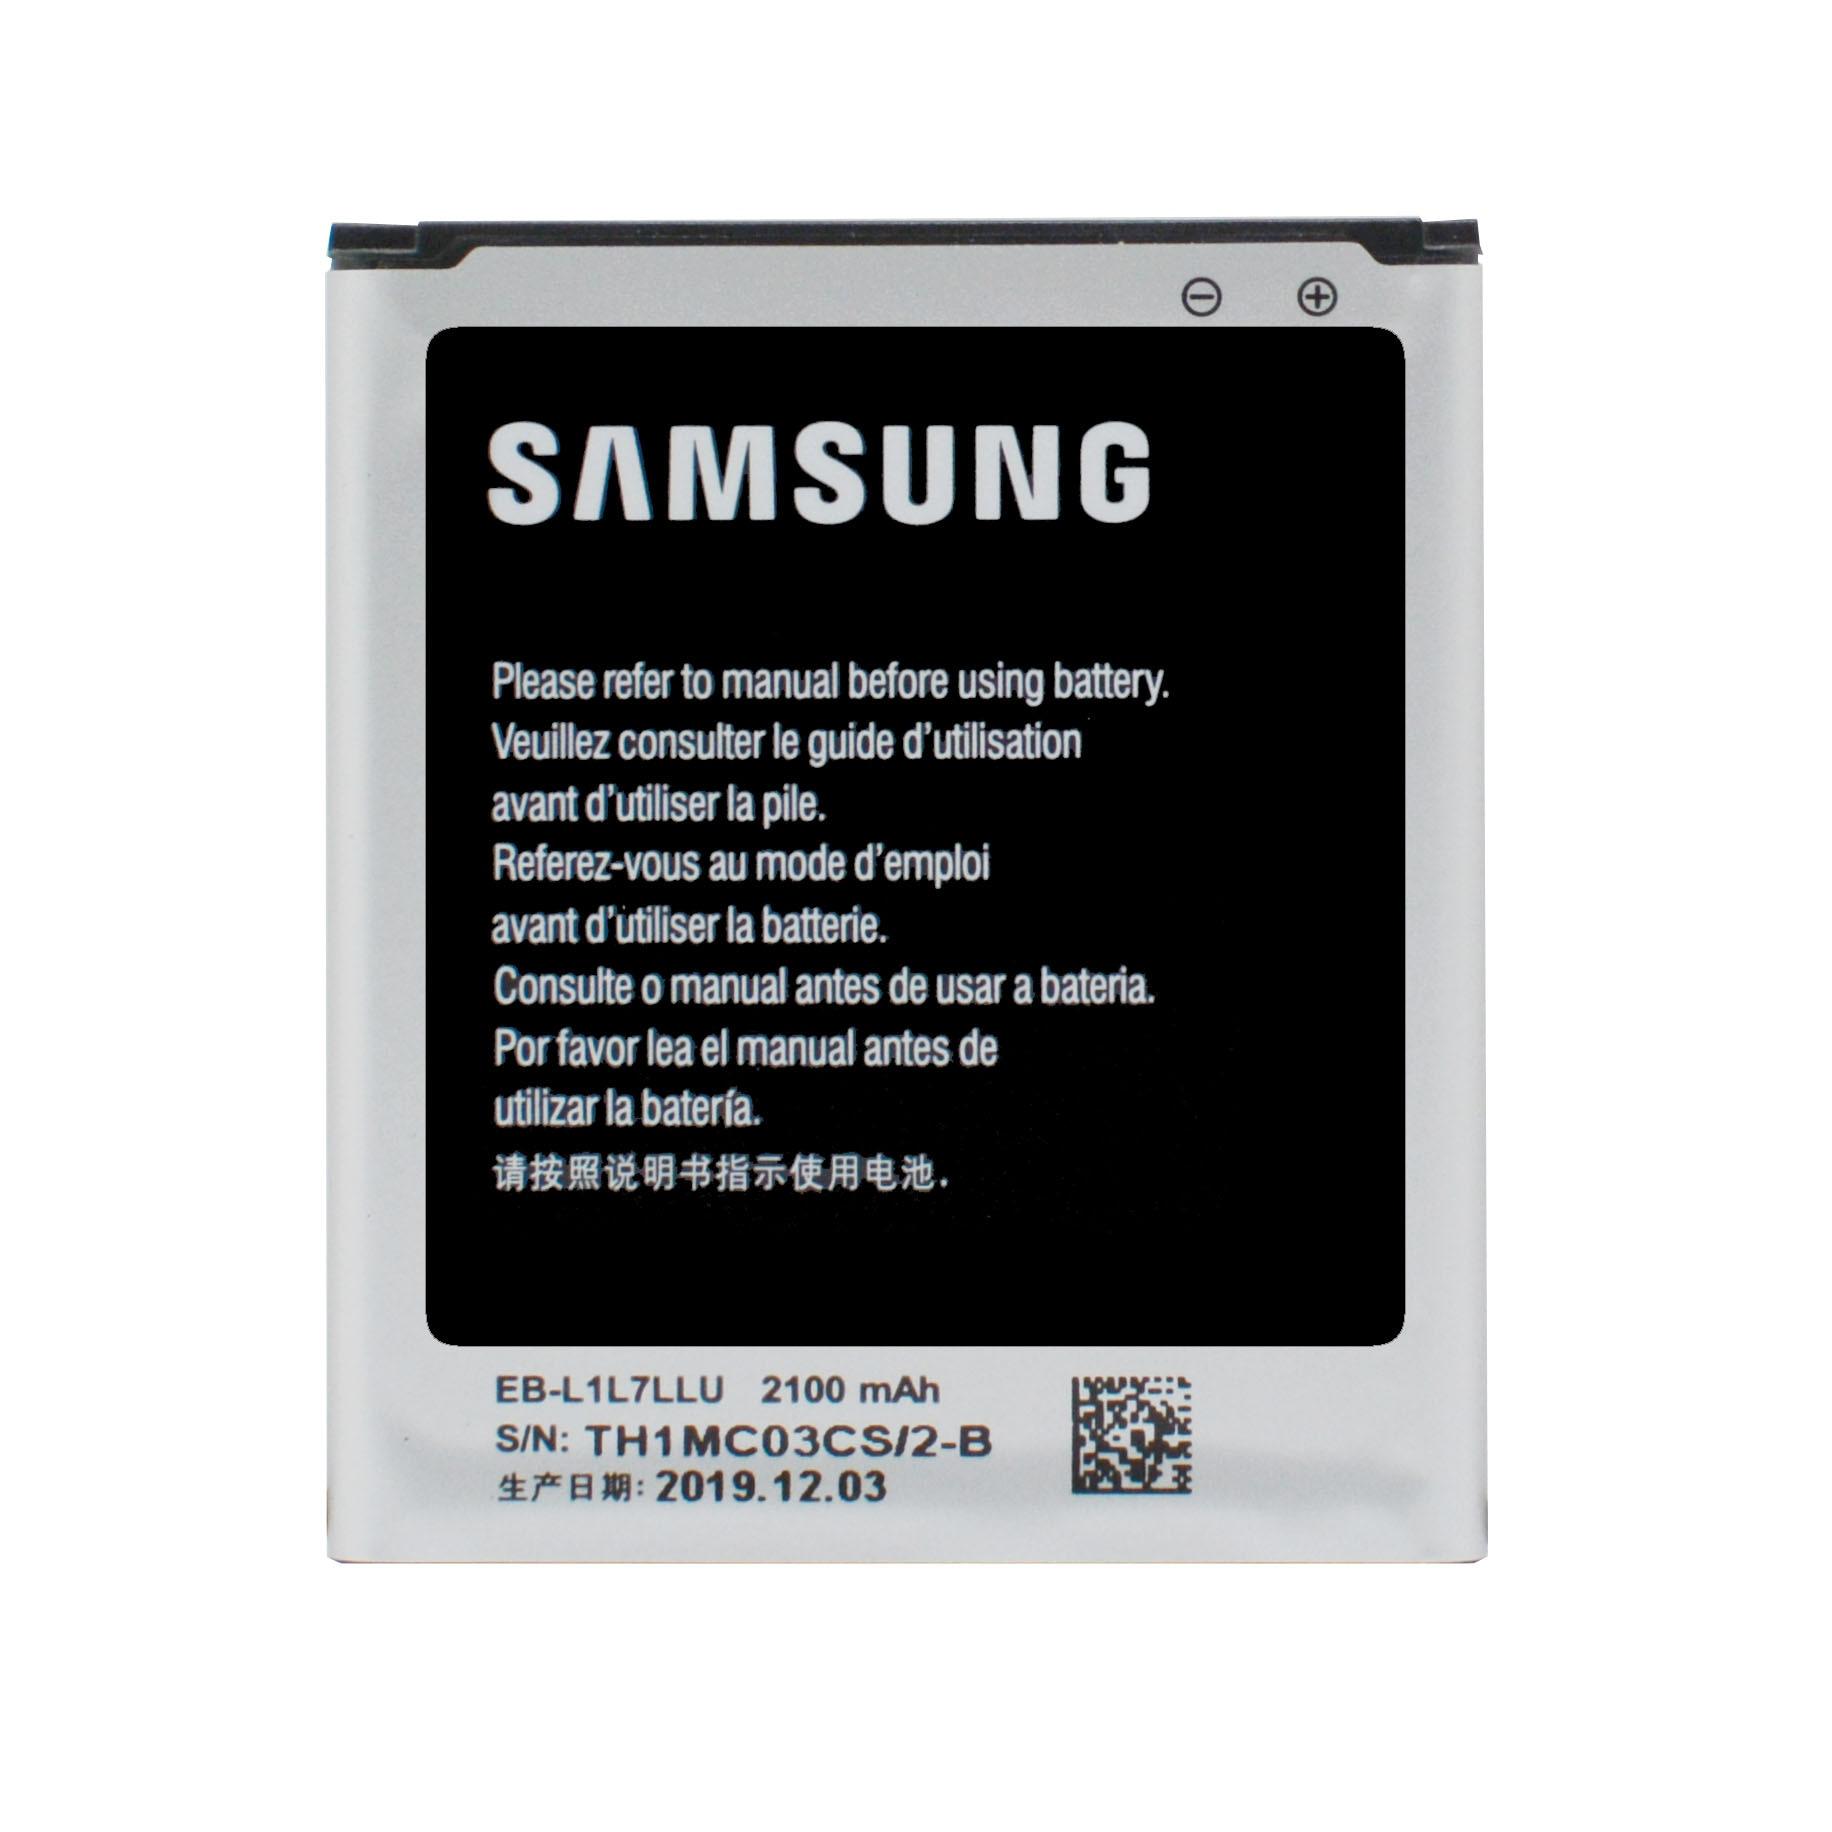 20pcs/lot Battery EB-L1L7LLU For Samsung Galaxy Express 2 G3815 G3818 G3819 G3812 i939 i9260 I9268 Phone Bateria 2100mAh enlarge